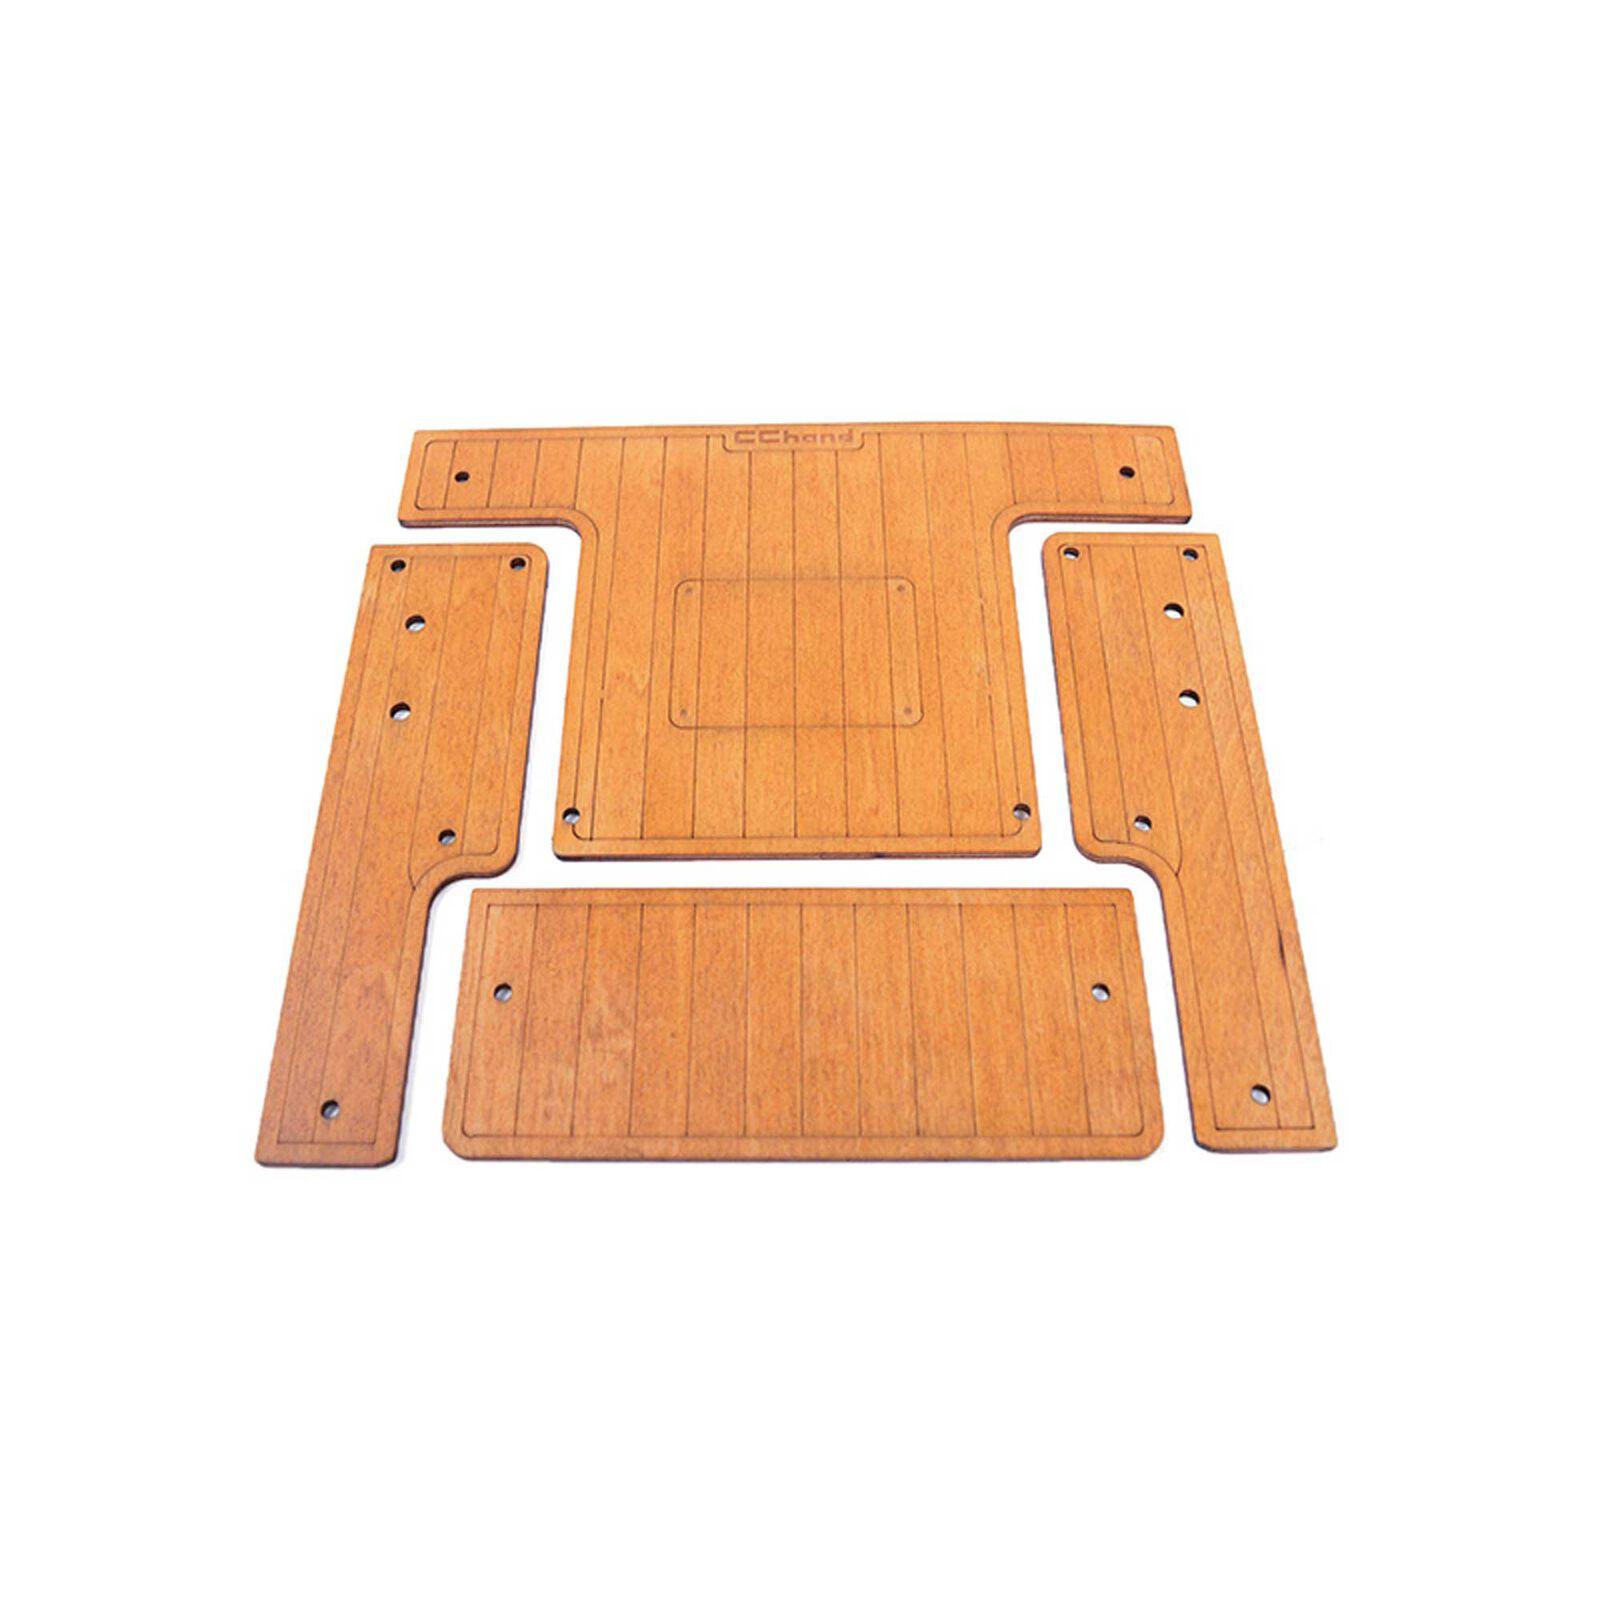 Cargo Bed Wood Decking-Gelande II 2015 D90